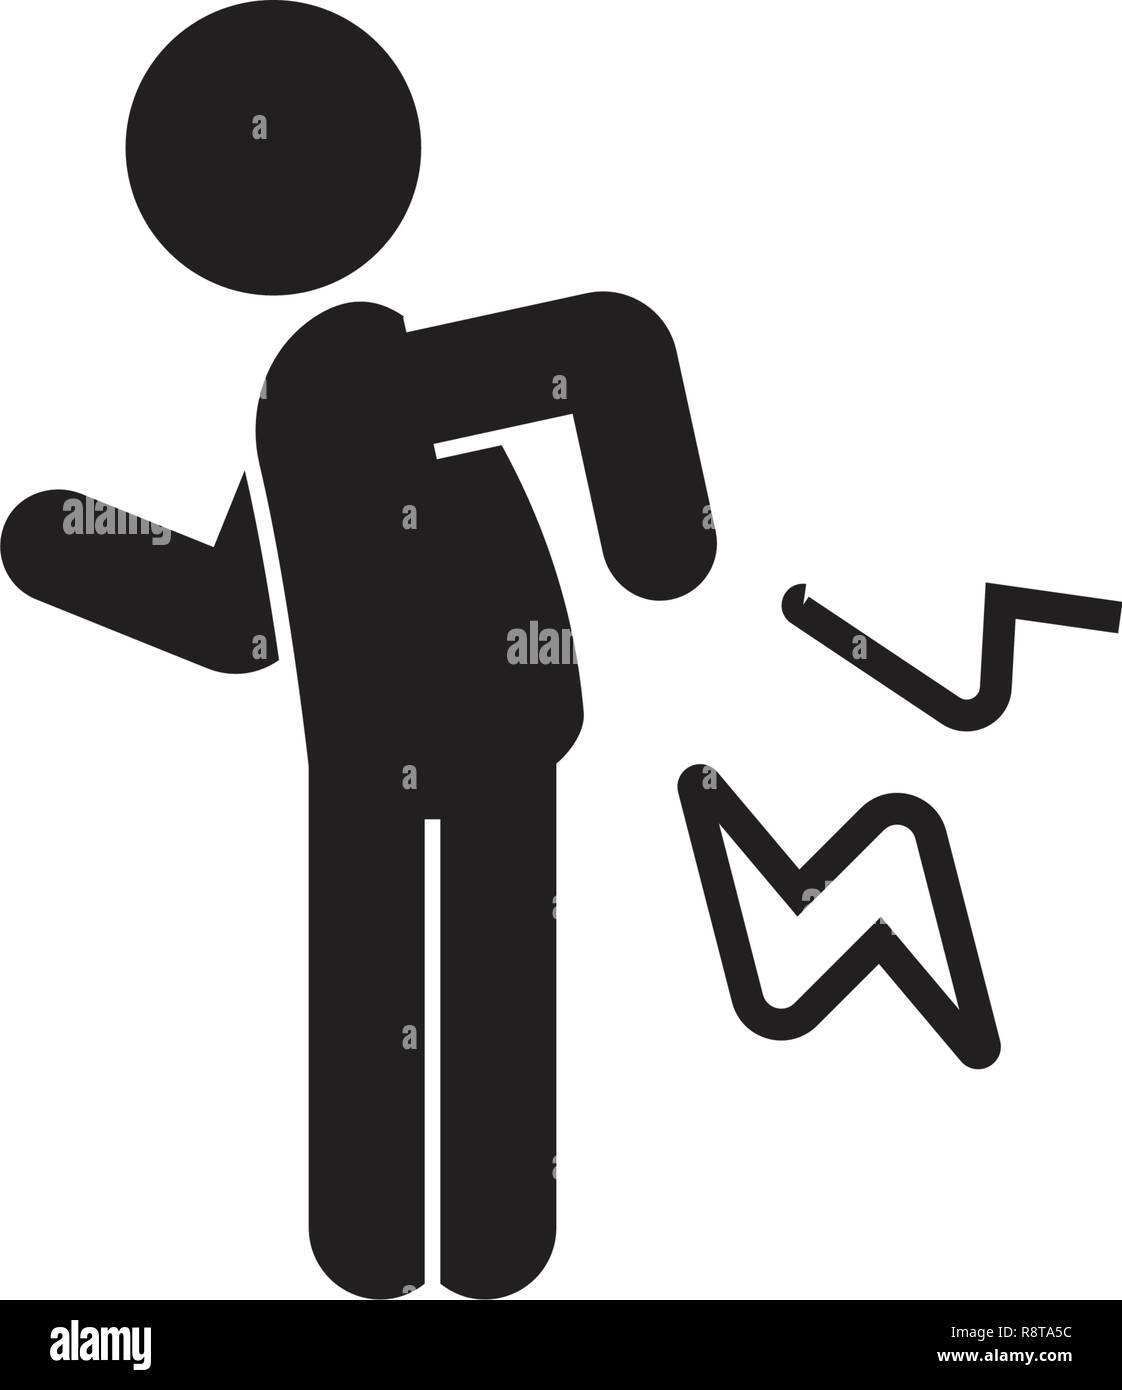 Rheumatoid arthritis black vector concept icon. Rheumatoid arthritis flat illustration, sign - Stock Image